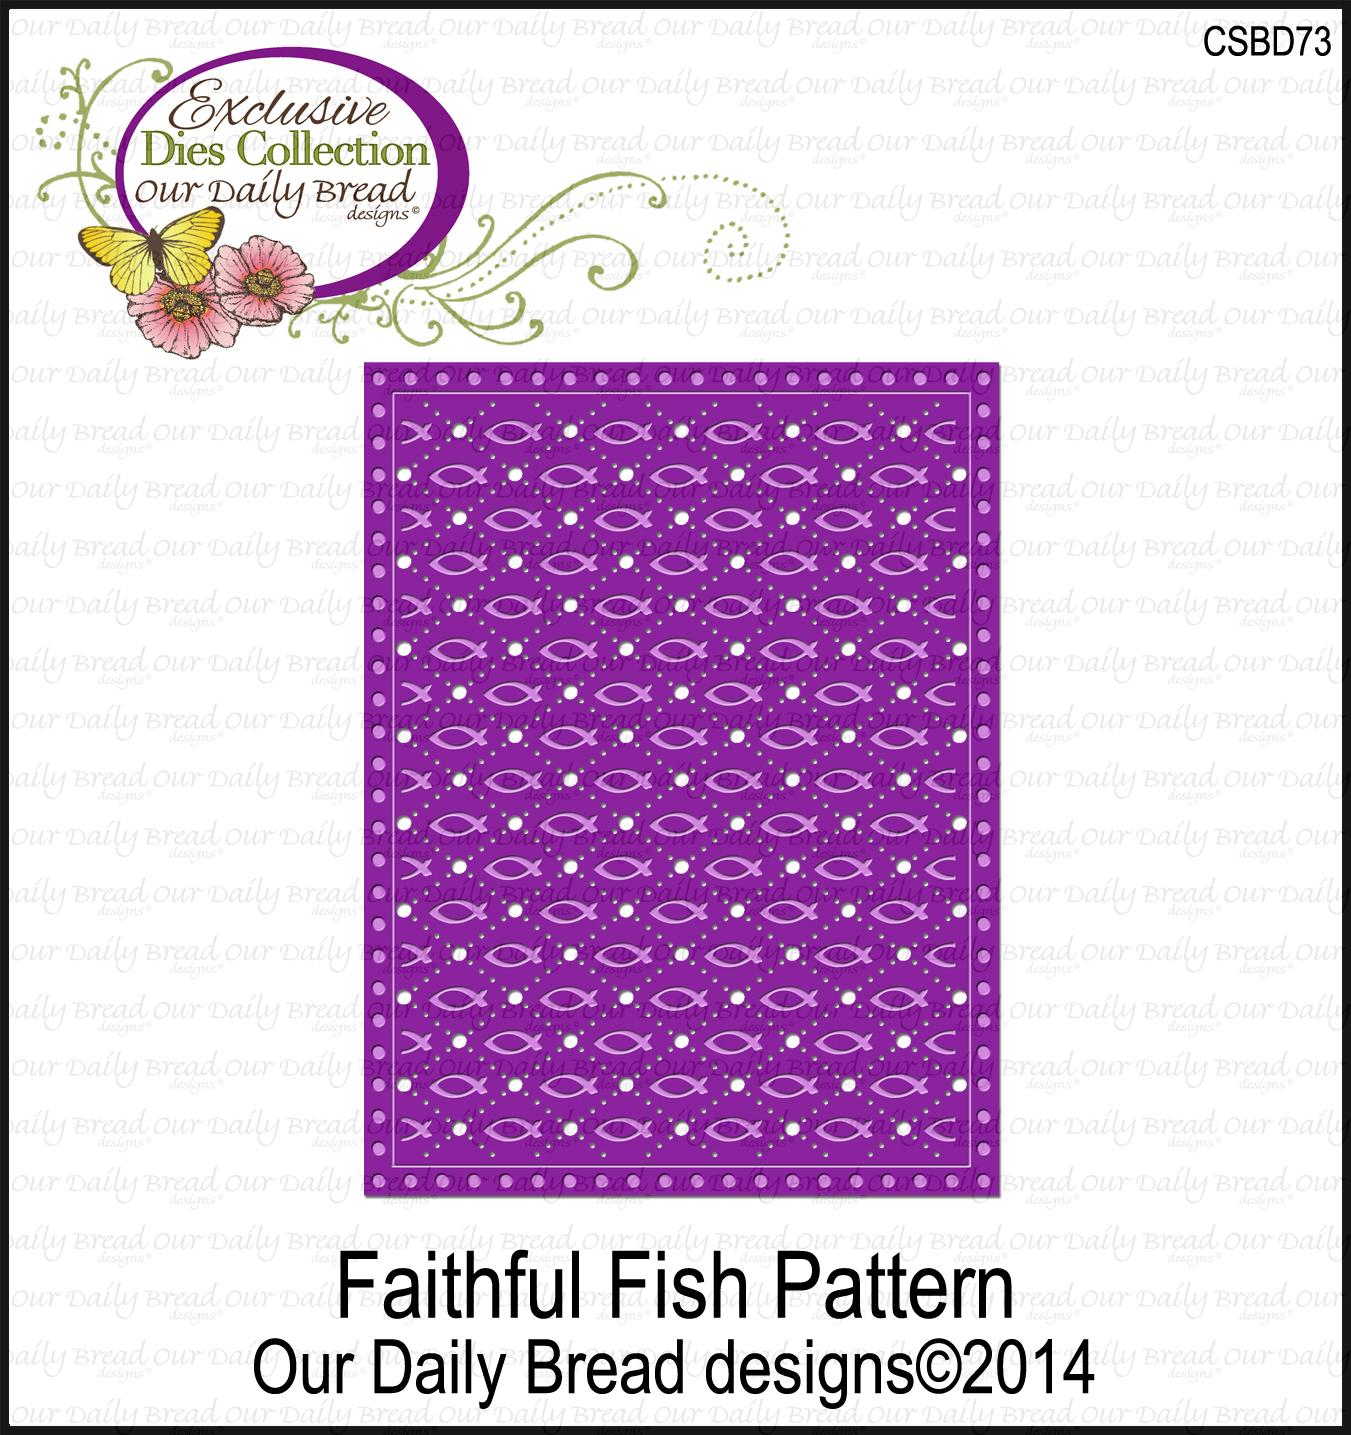 https://www.ourdailybreaddesigns.com/index.php/csbd73-faithful-fish-pattern-die-debossing-plate.html